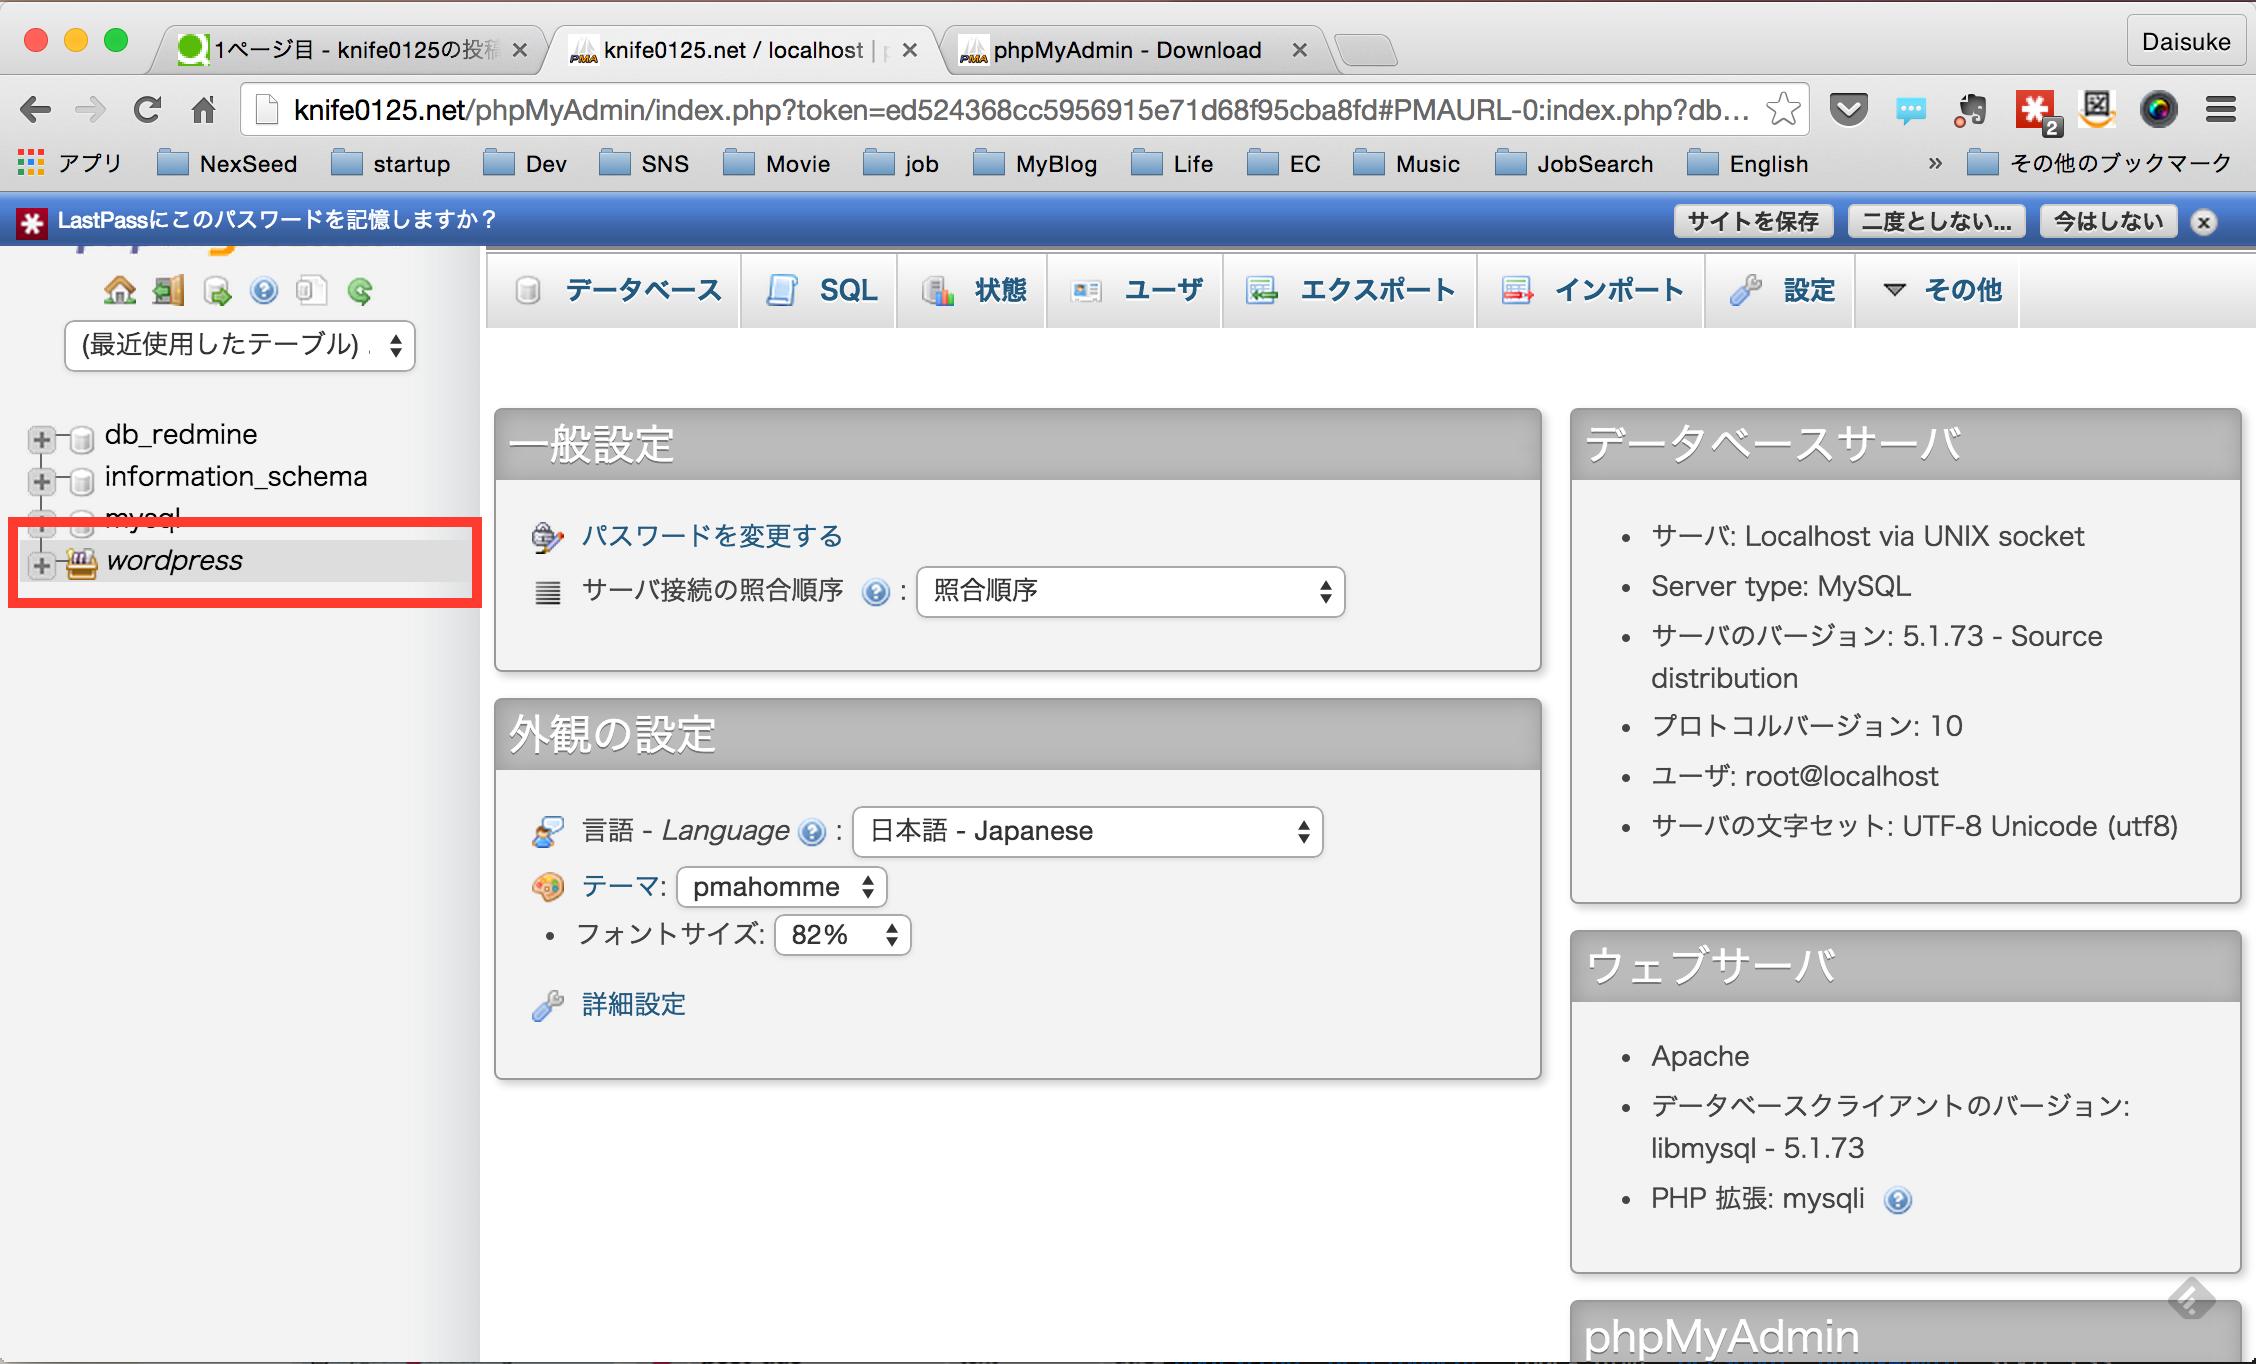 PHPMyAdmin_Export_02.png